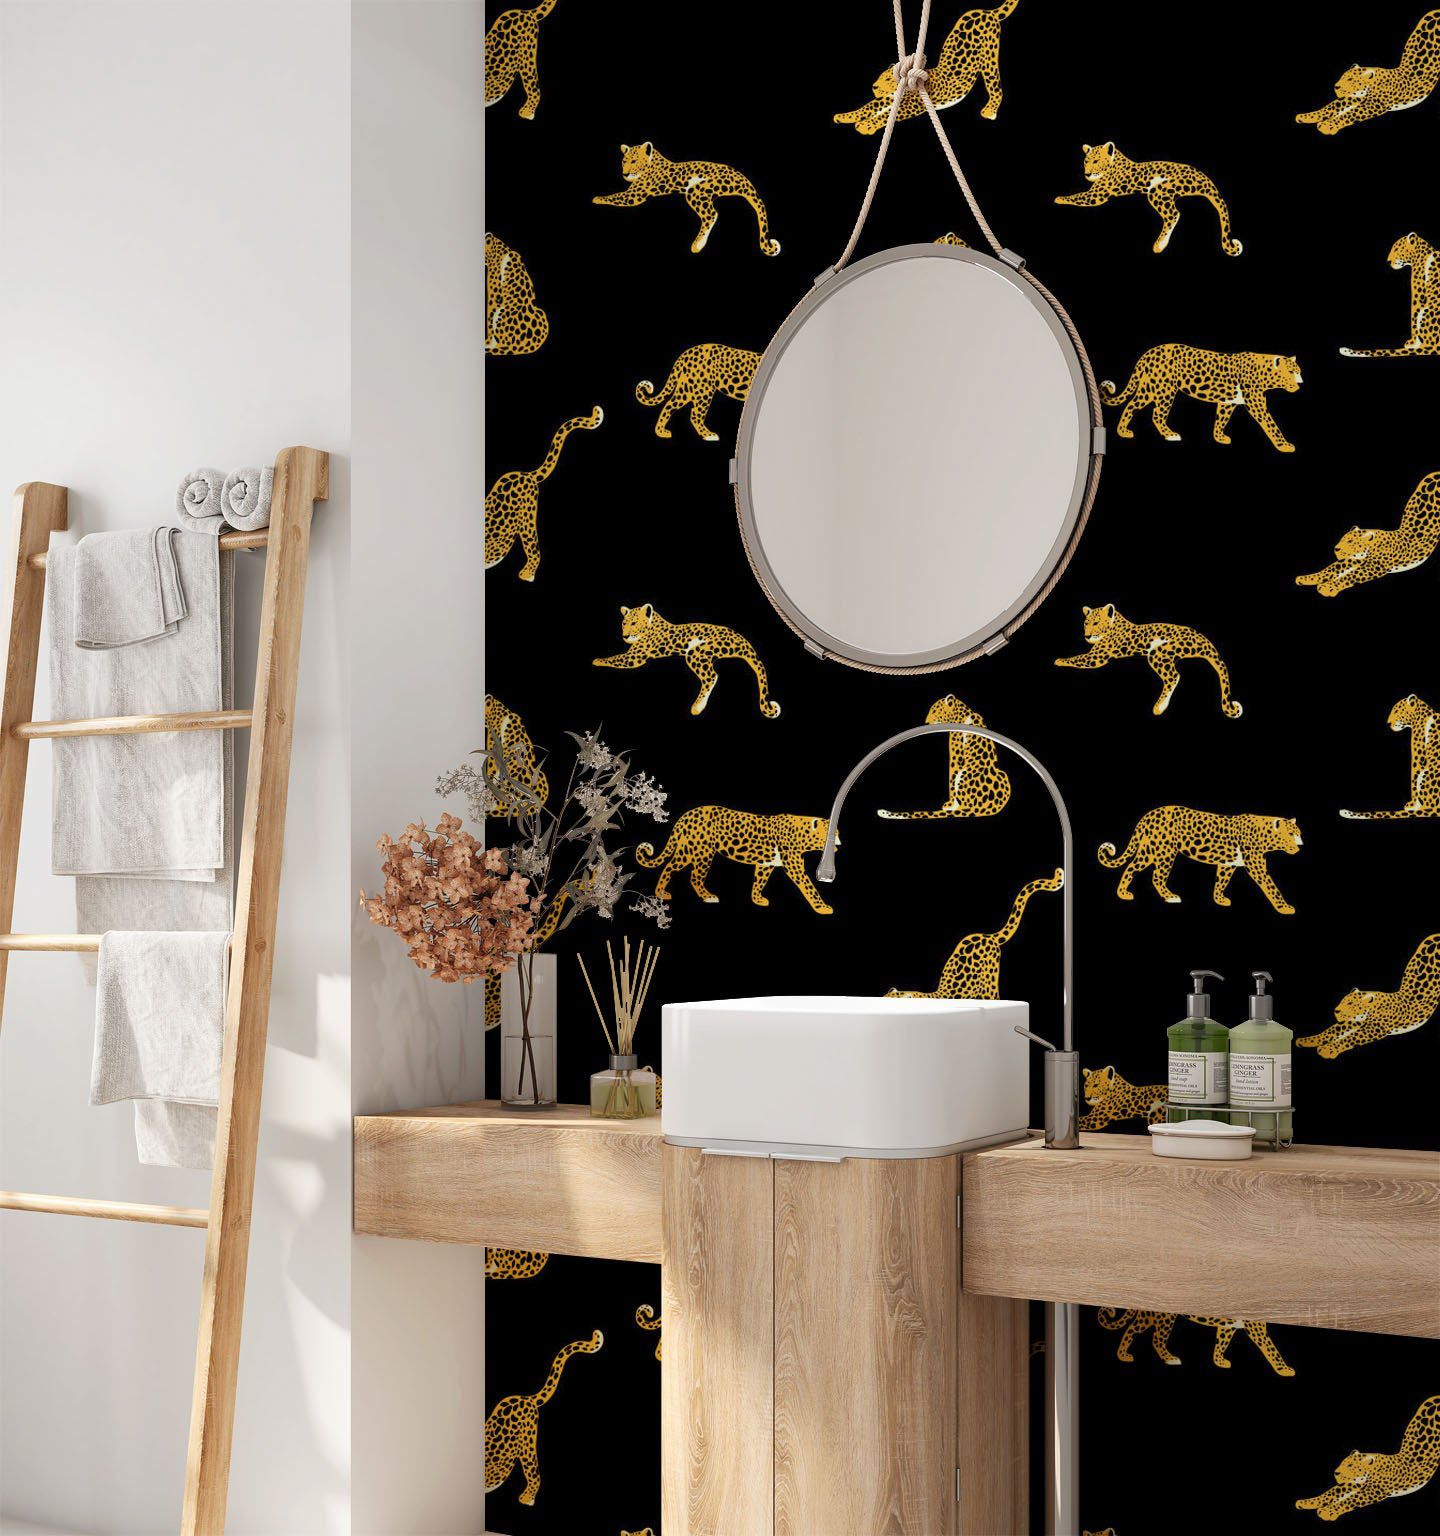 Peel And Stick Wallpaper For Bathroom Walls